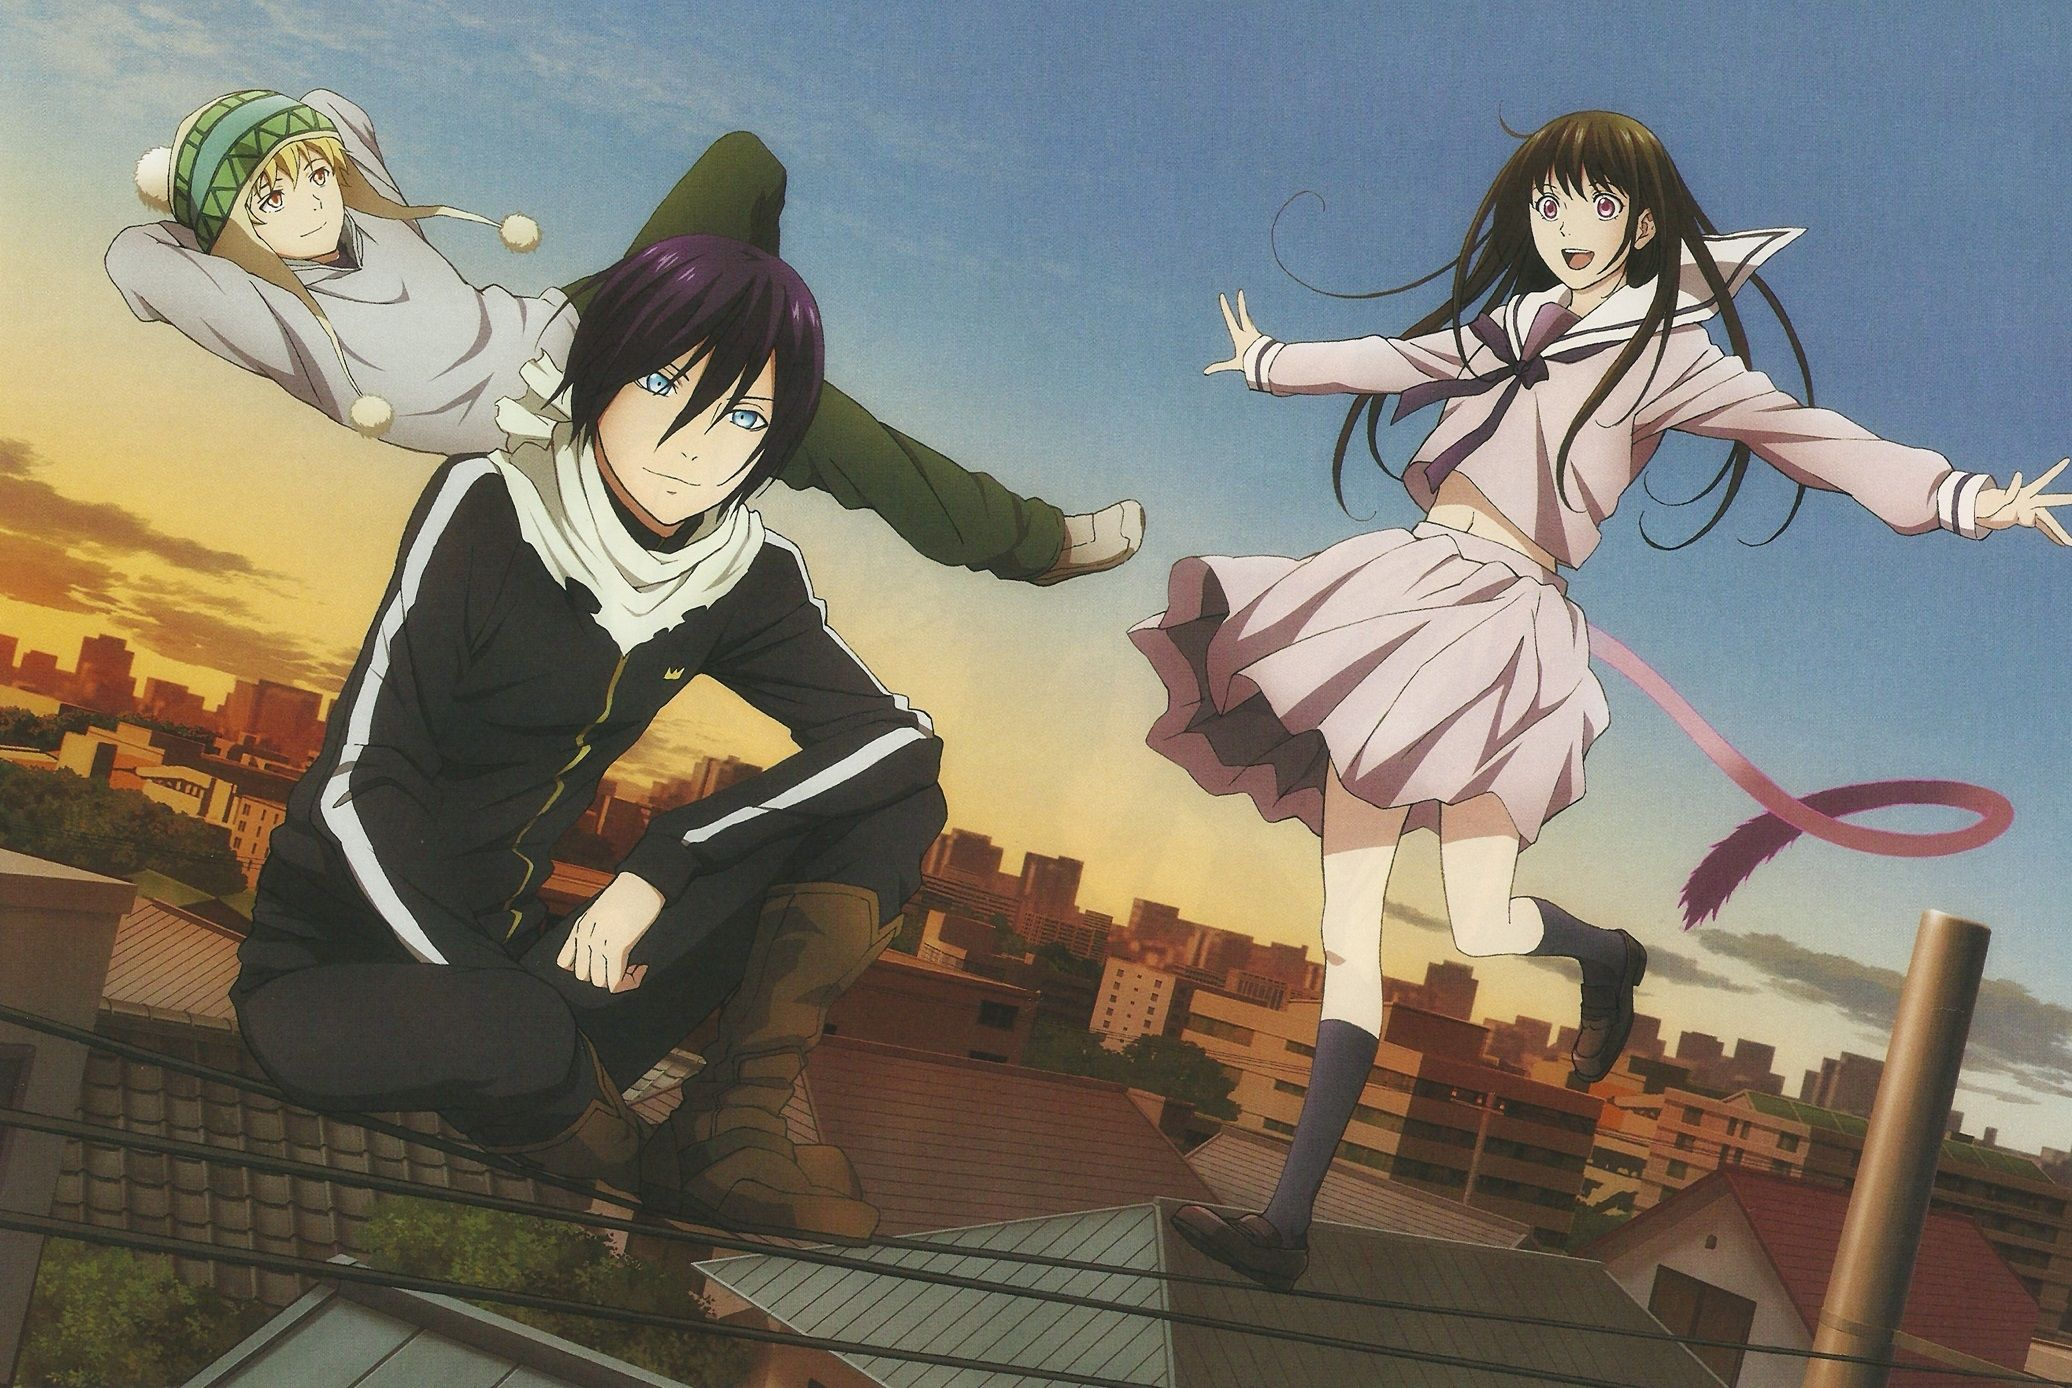 Anime Noragami Yato Yukine Hiyori Iki Wallpaper Anime